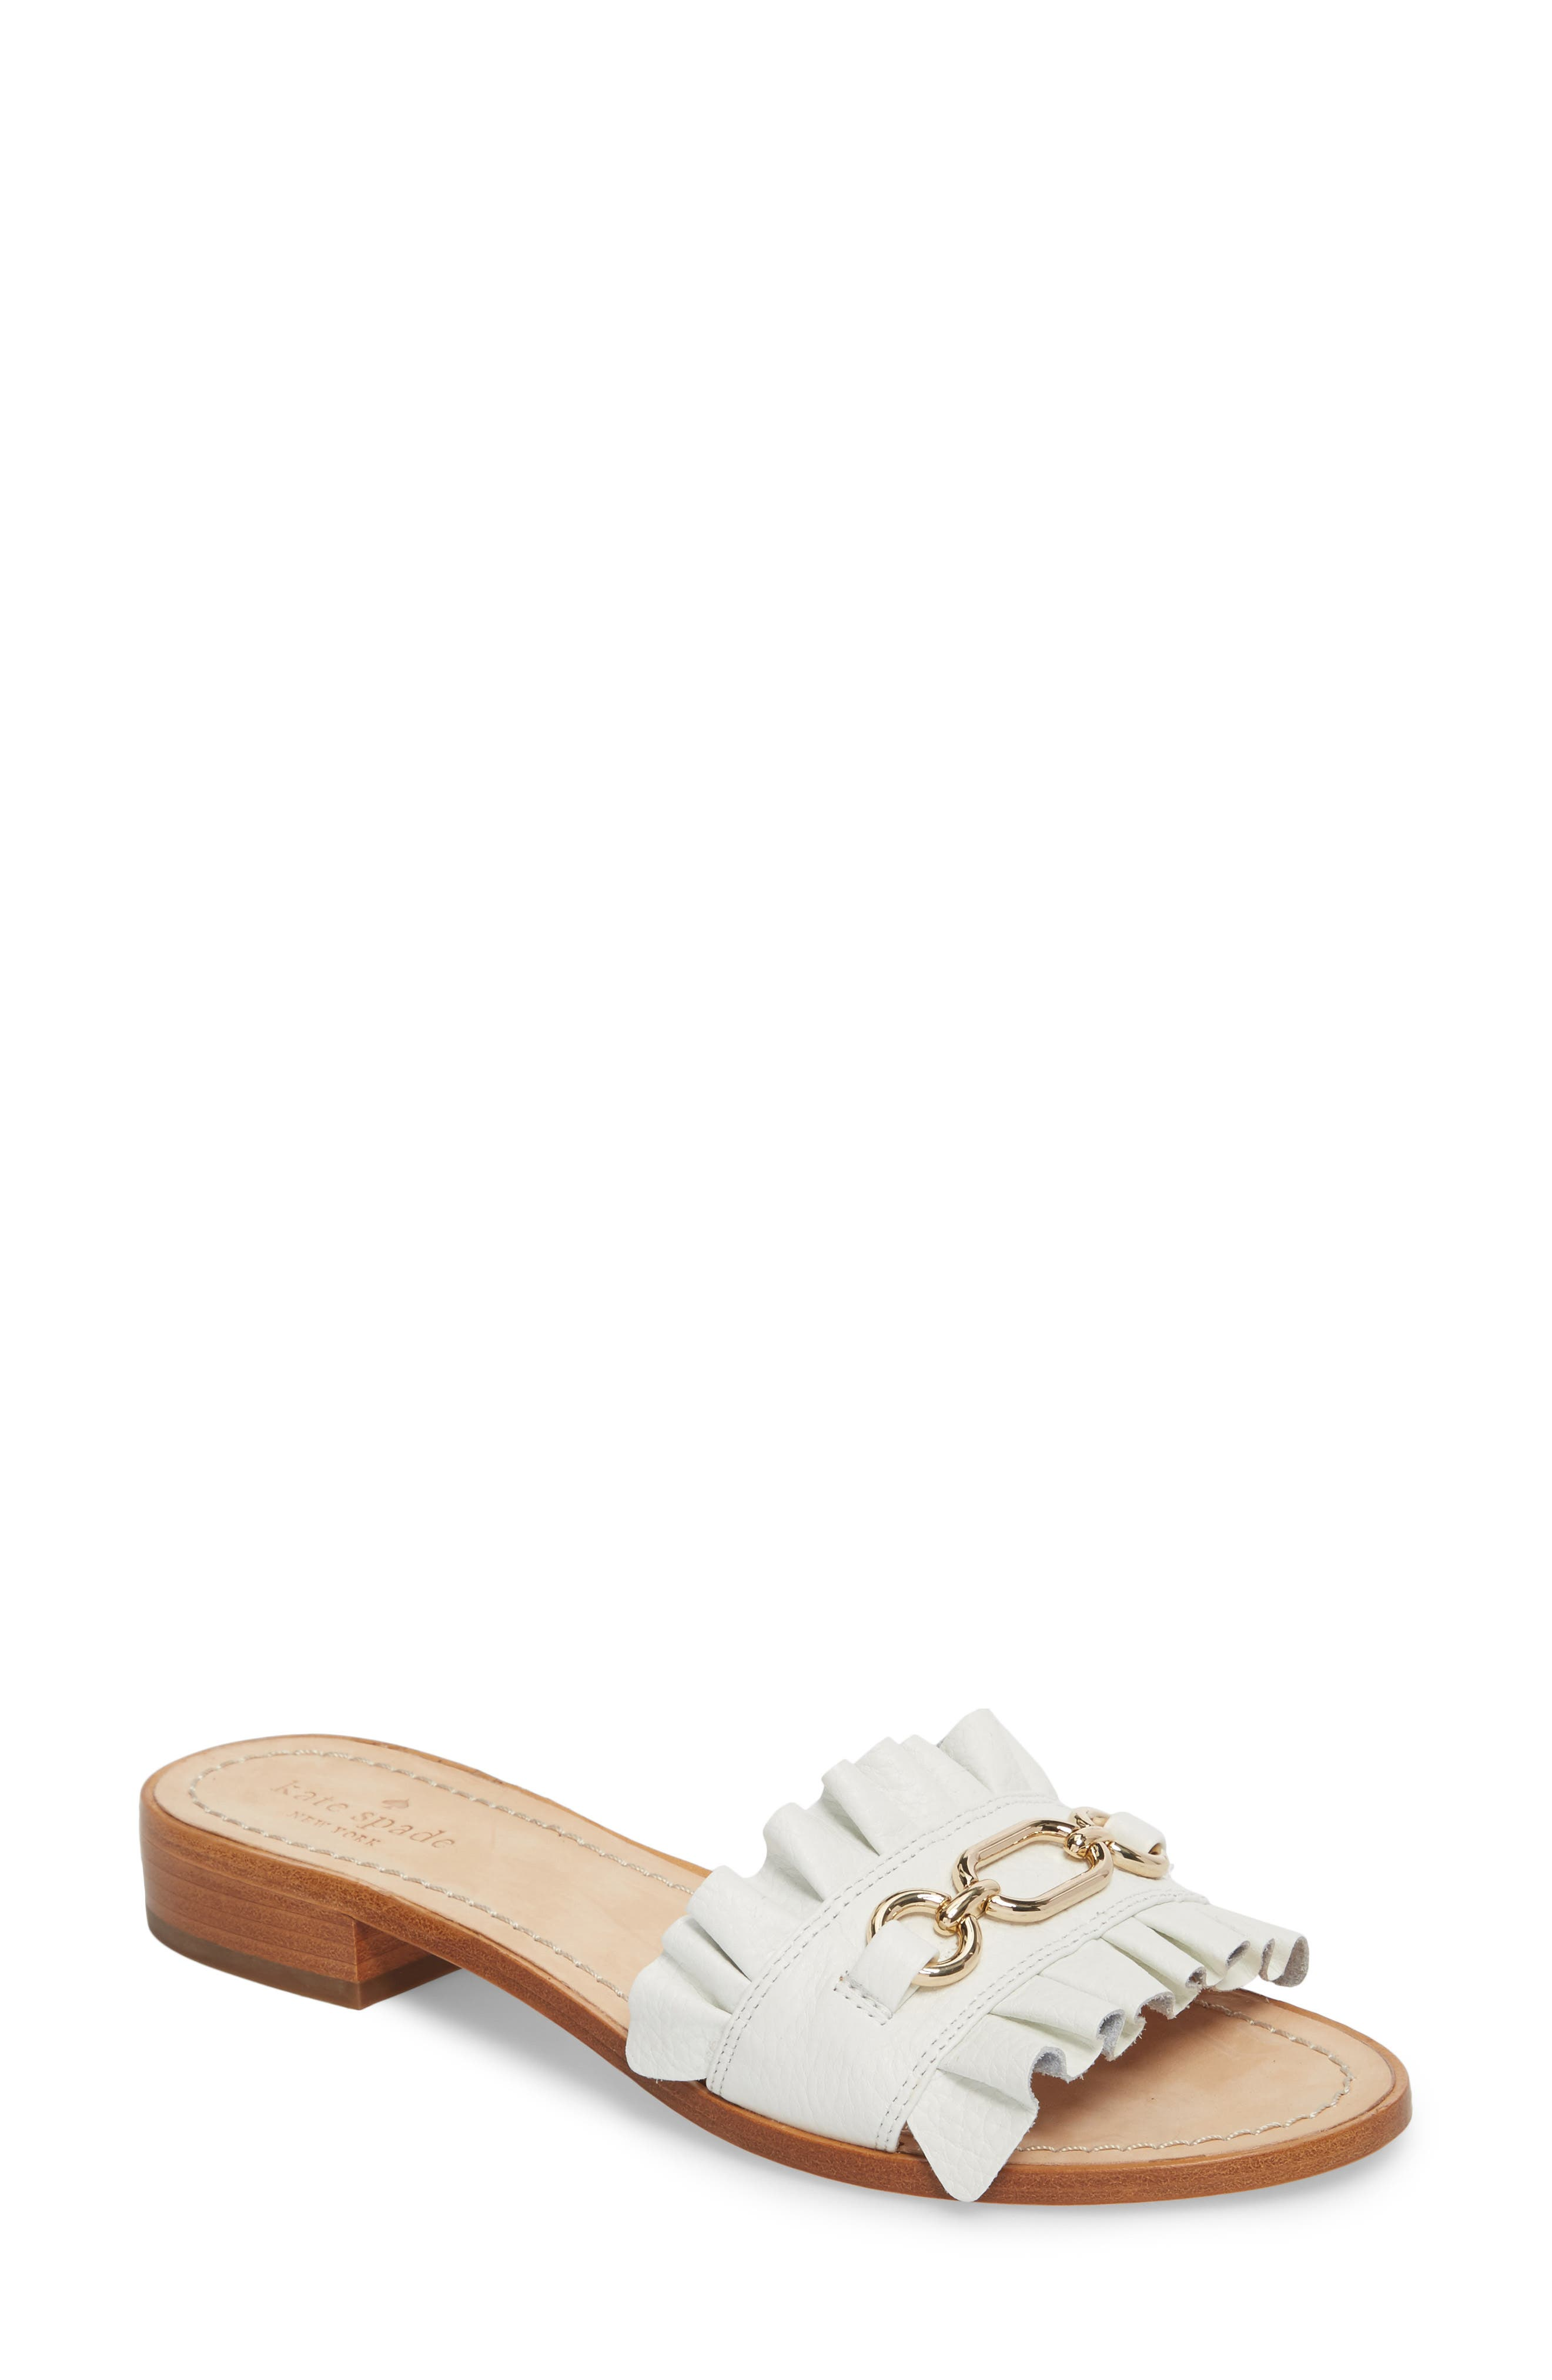 Women's Beau Slide Sandal